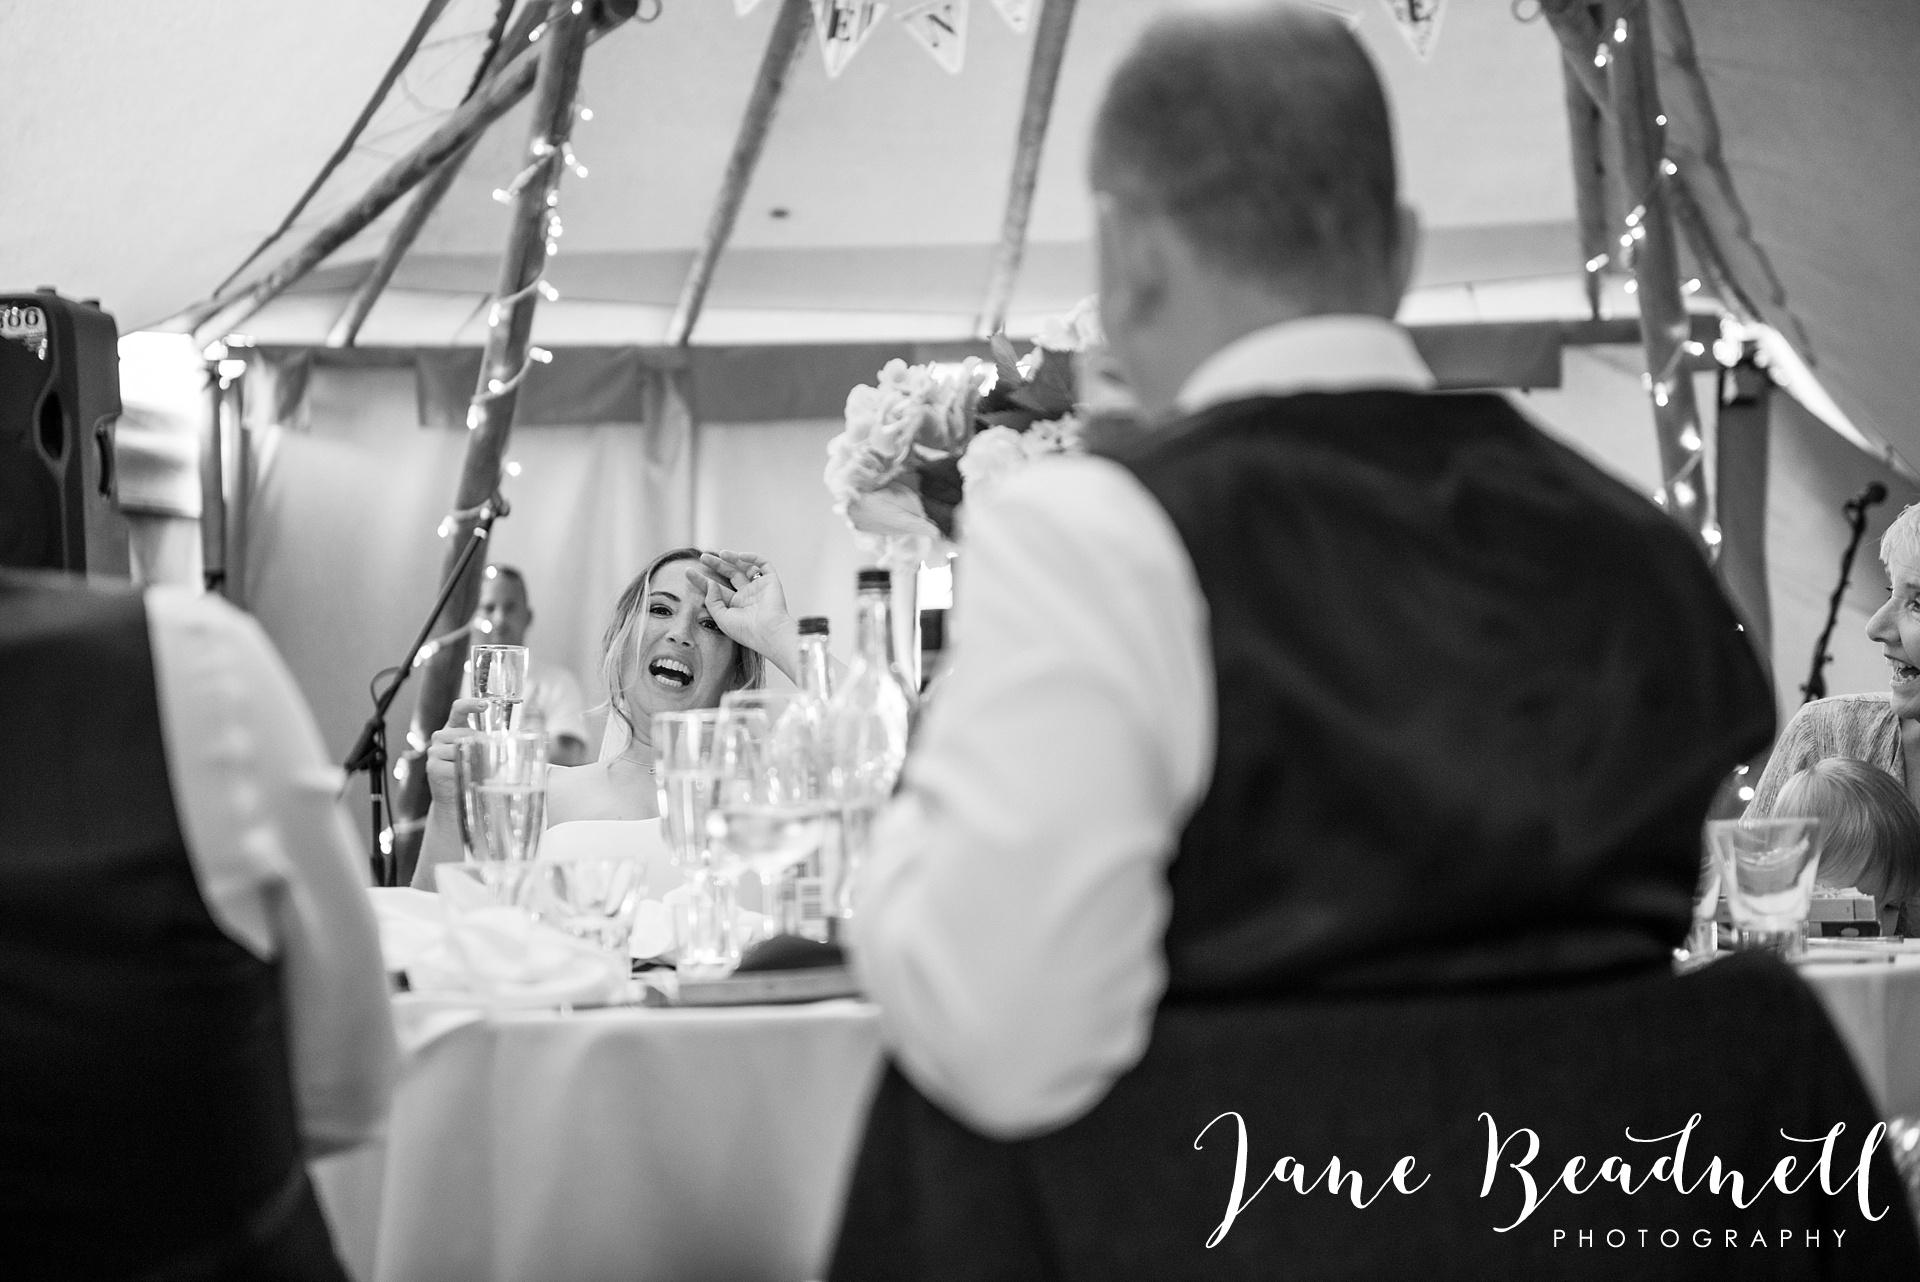 fine-art-wedding-photographer-jane-beadnell-yorkshire-wedding-photographer_0137